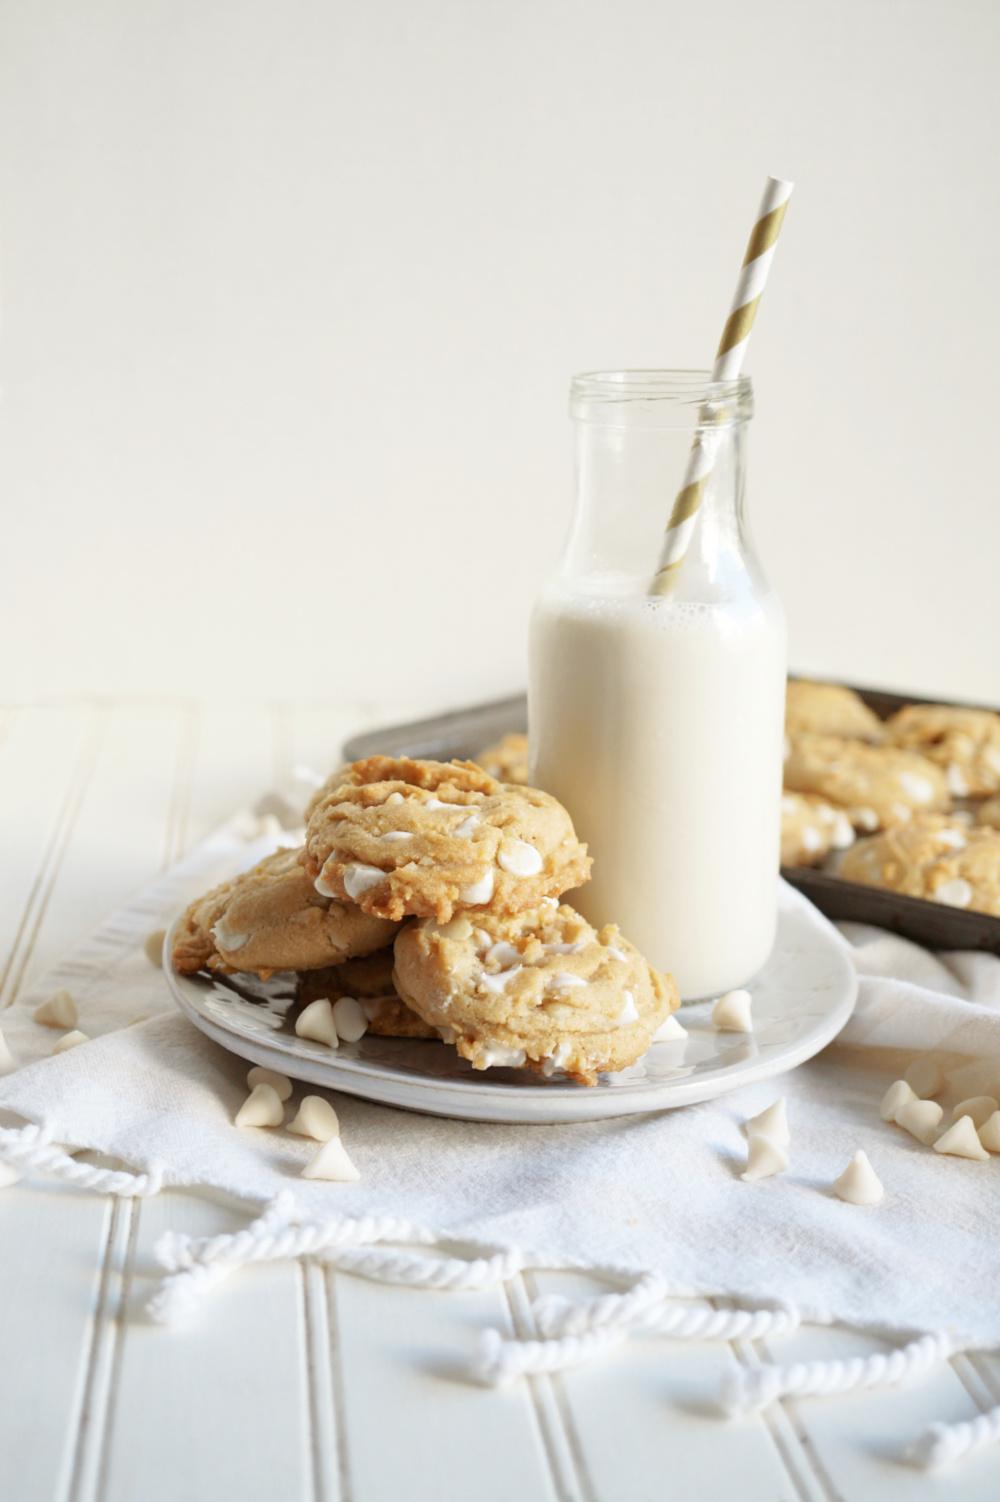 white chocolate macadamia cookies on plate